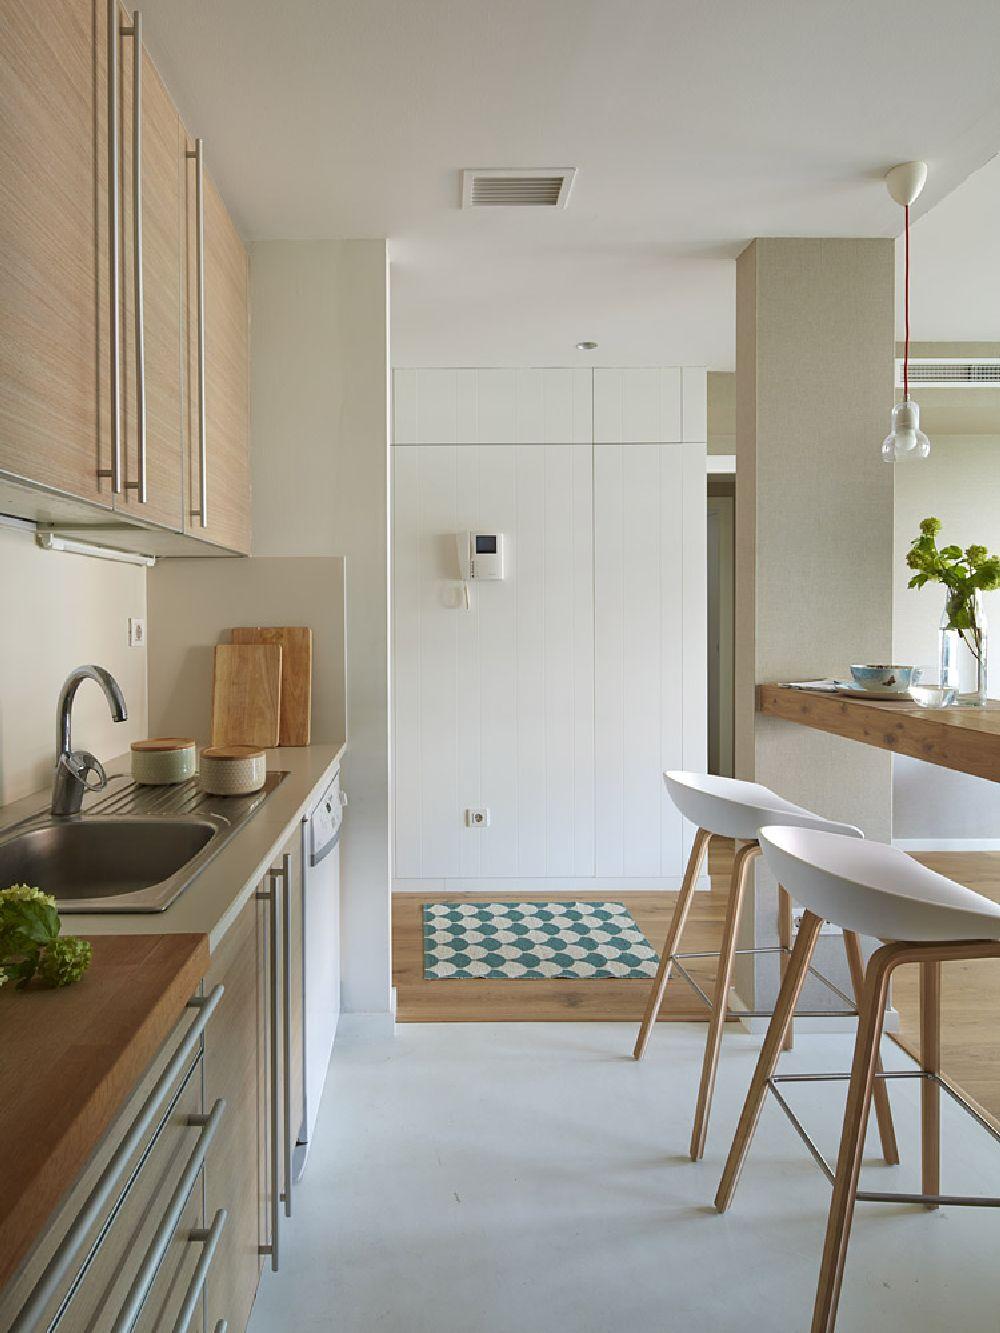 adelaparvu.com despre apartament cu aer mediteranean, design interior Meritxell Ribe (9)